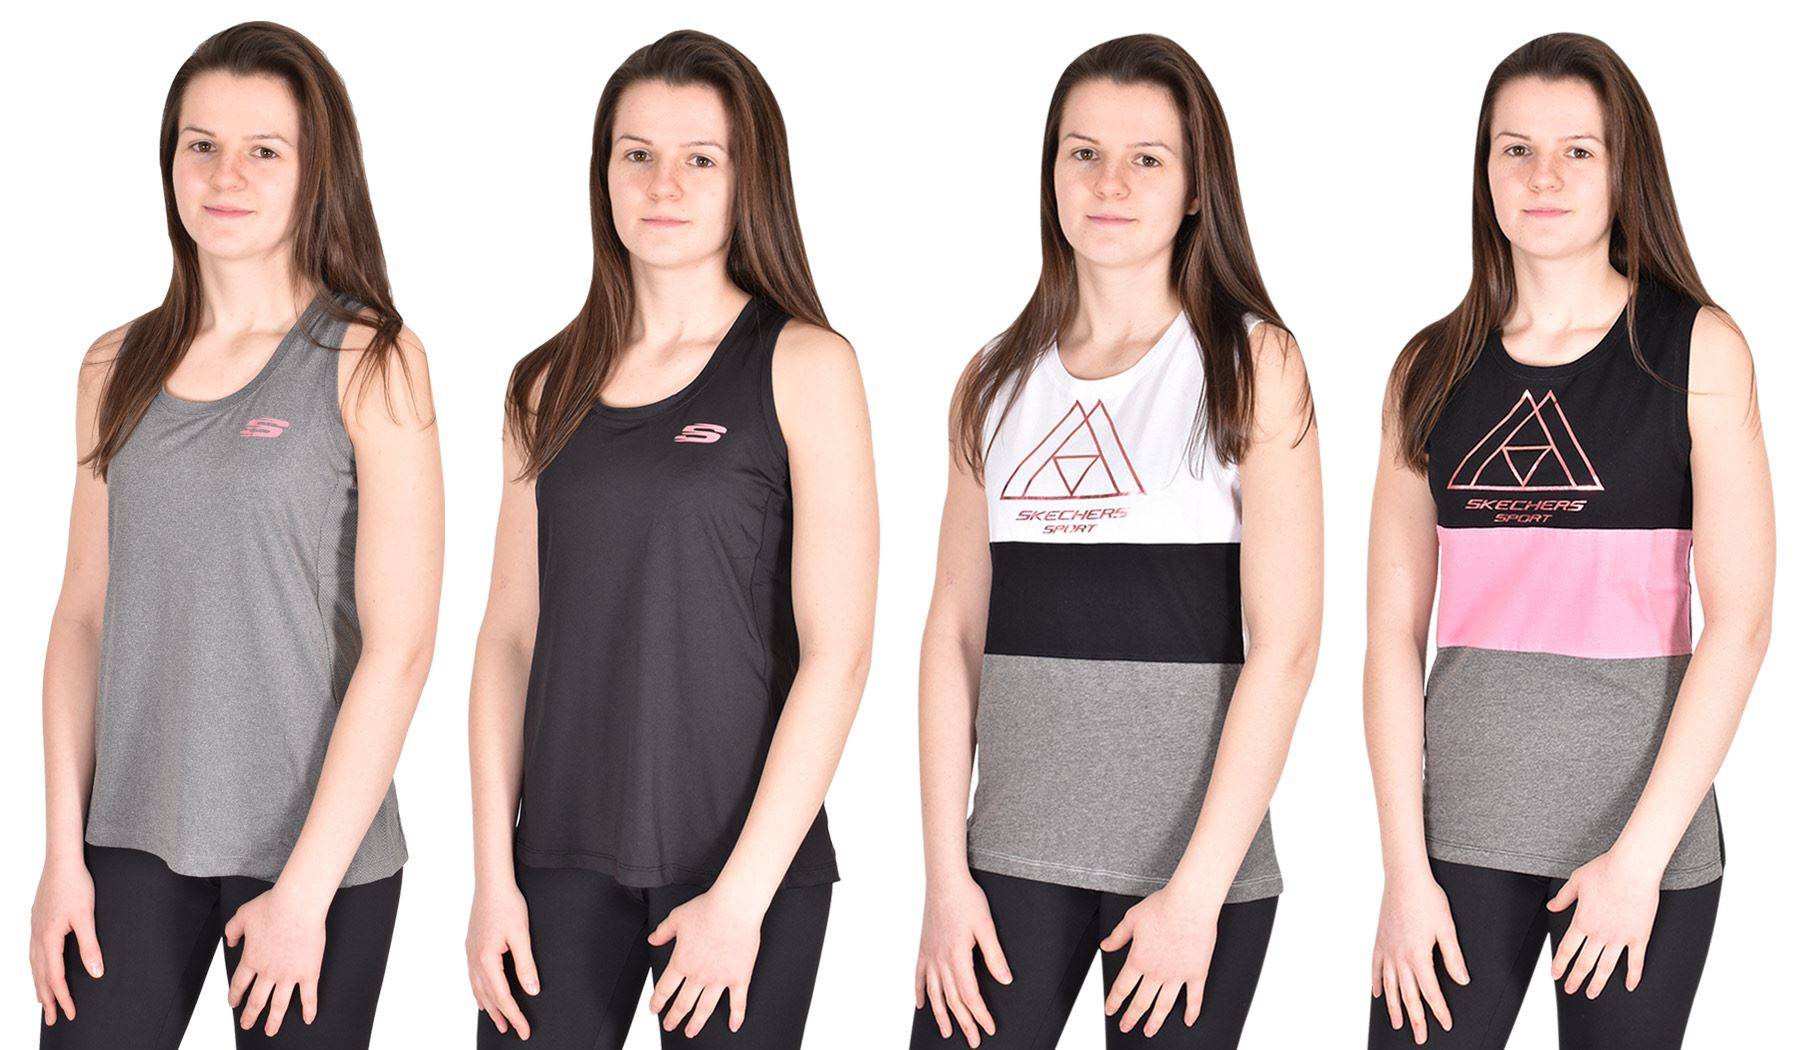 Skechers Womens Vests Gym Keep Fit Sports Ladies Activewear Tops Fitness  Yoga 3d14c7d8dc31